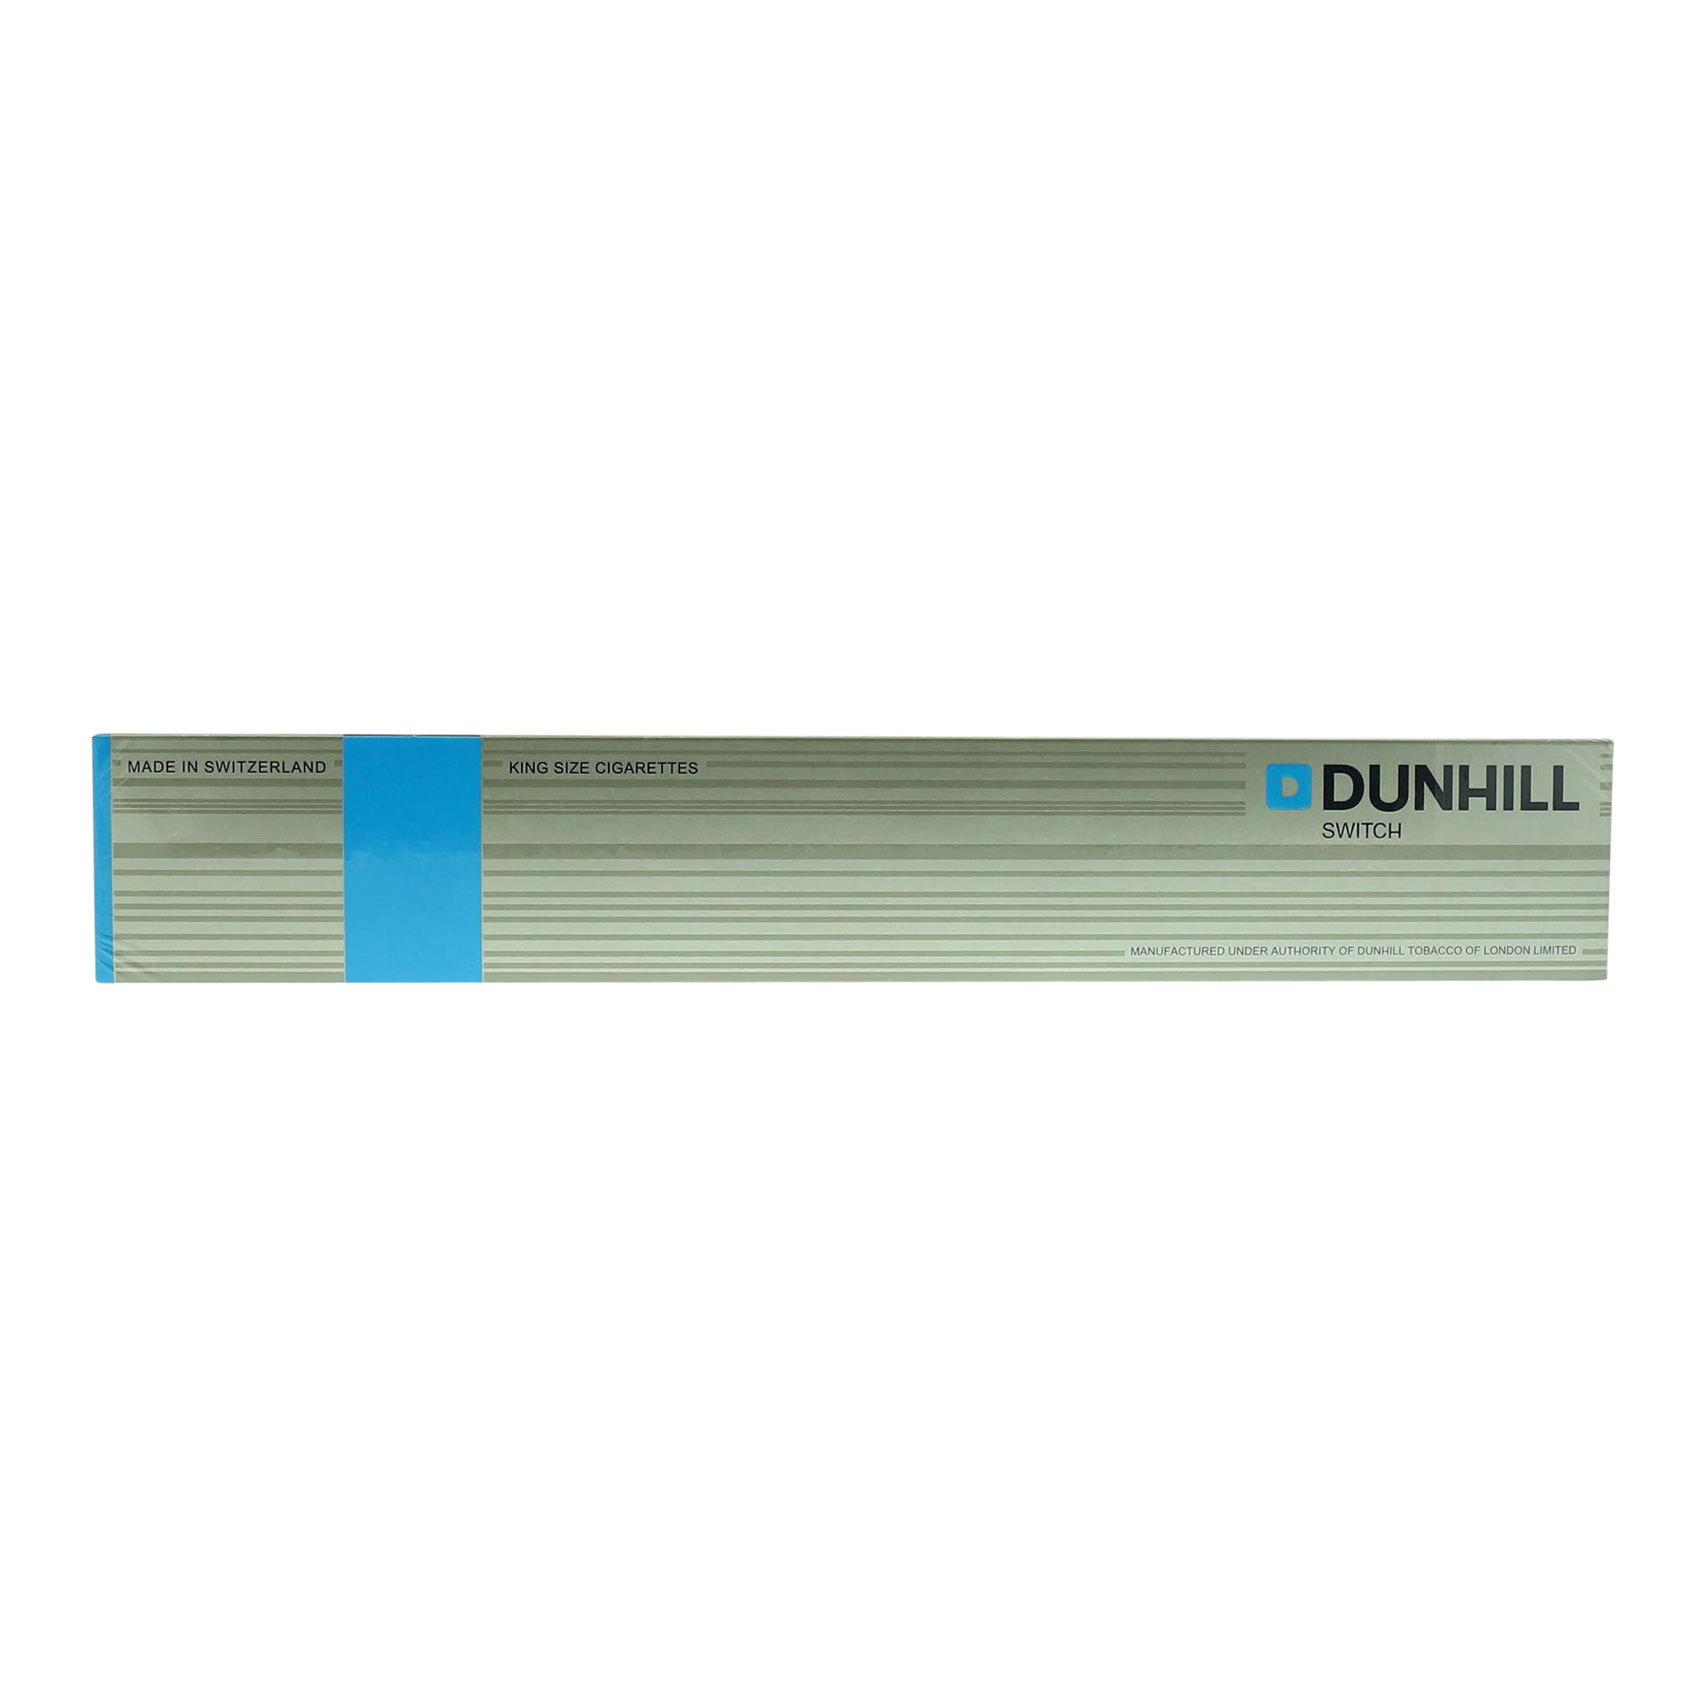 DUNHILL SPEARMINT CHMPNE 20'SX10